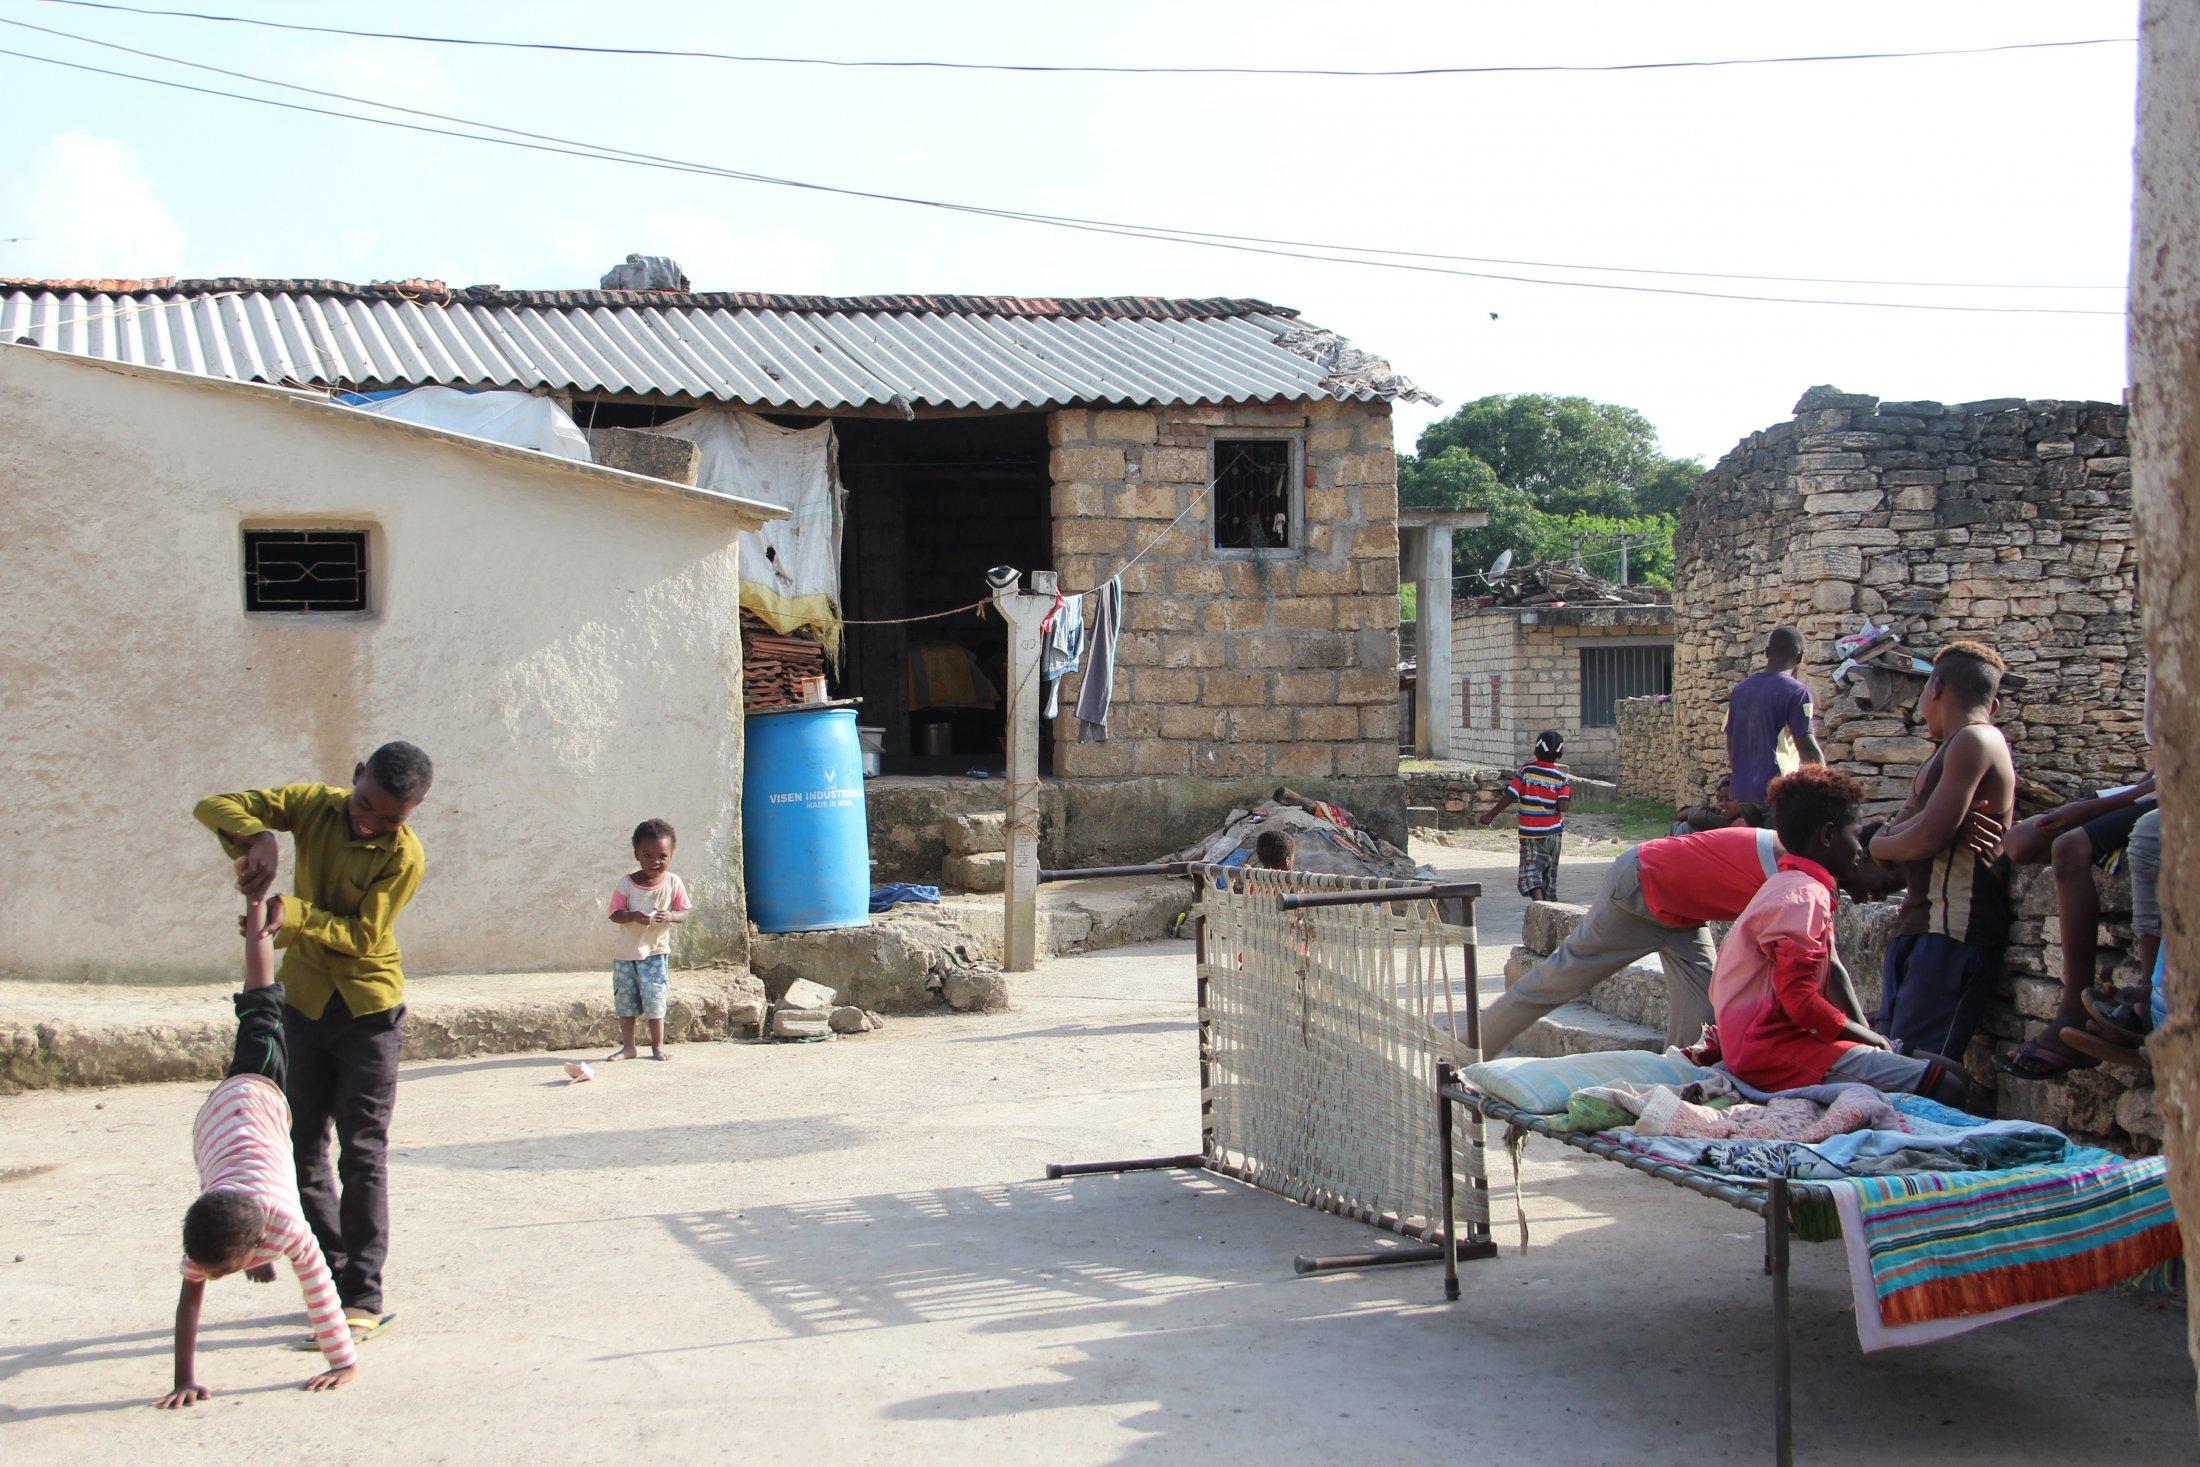 Sidi Village, Jambur